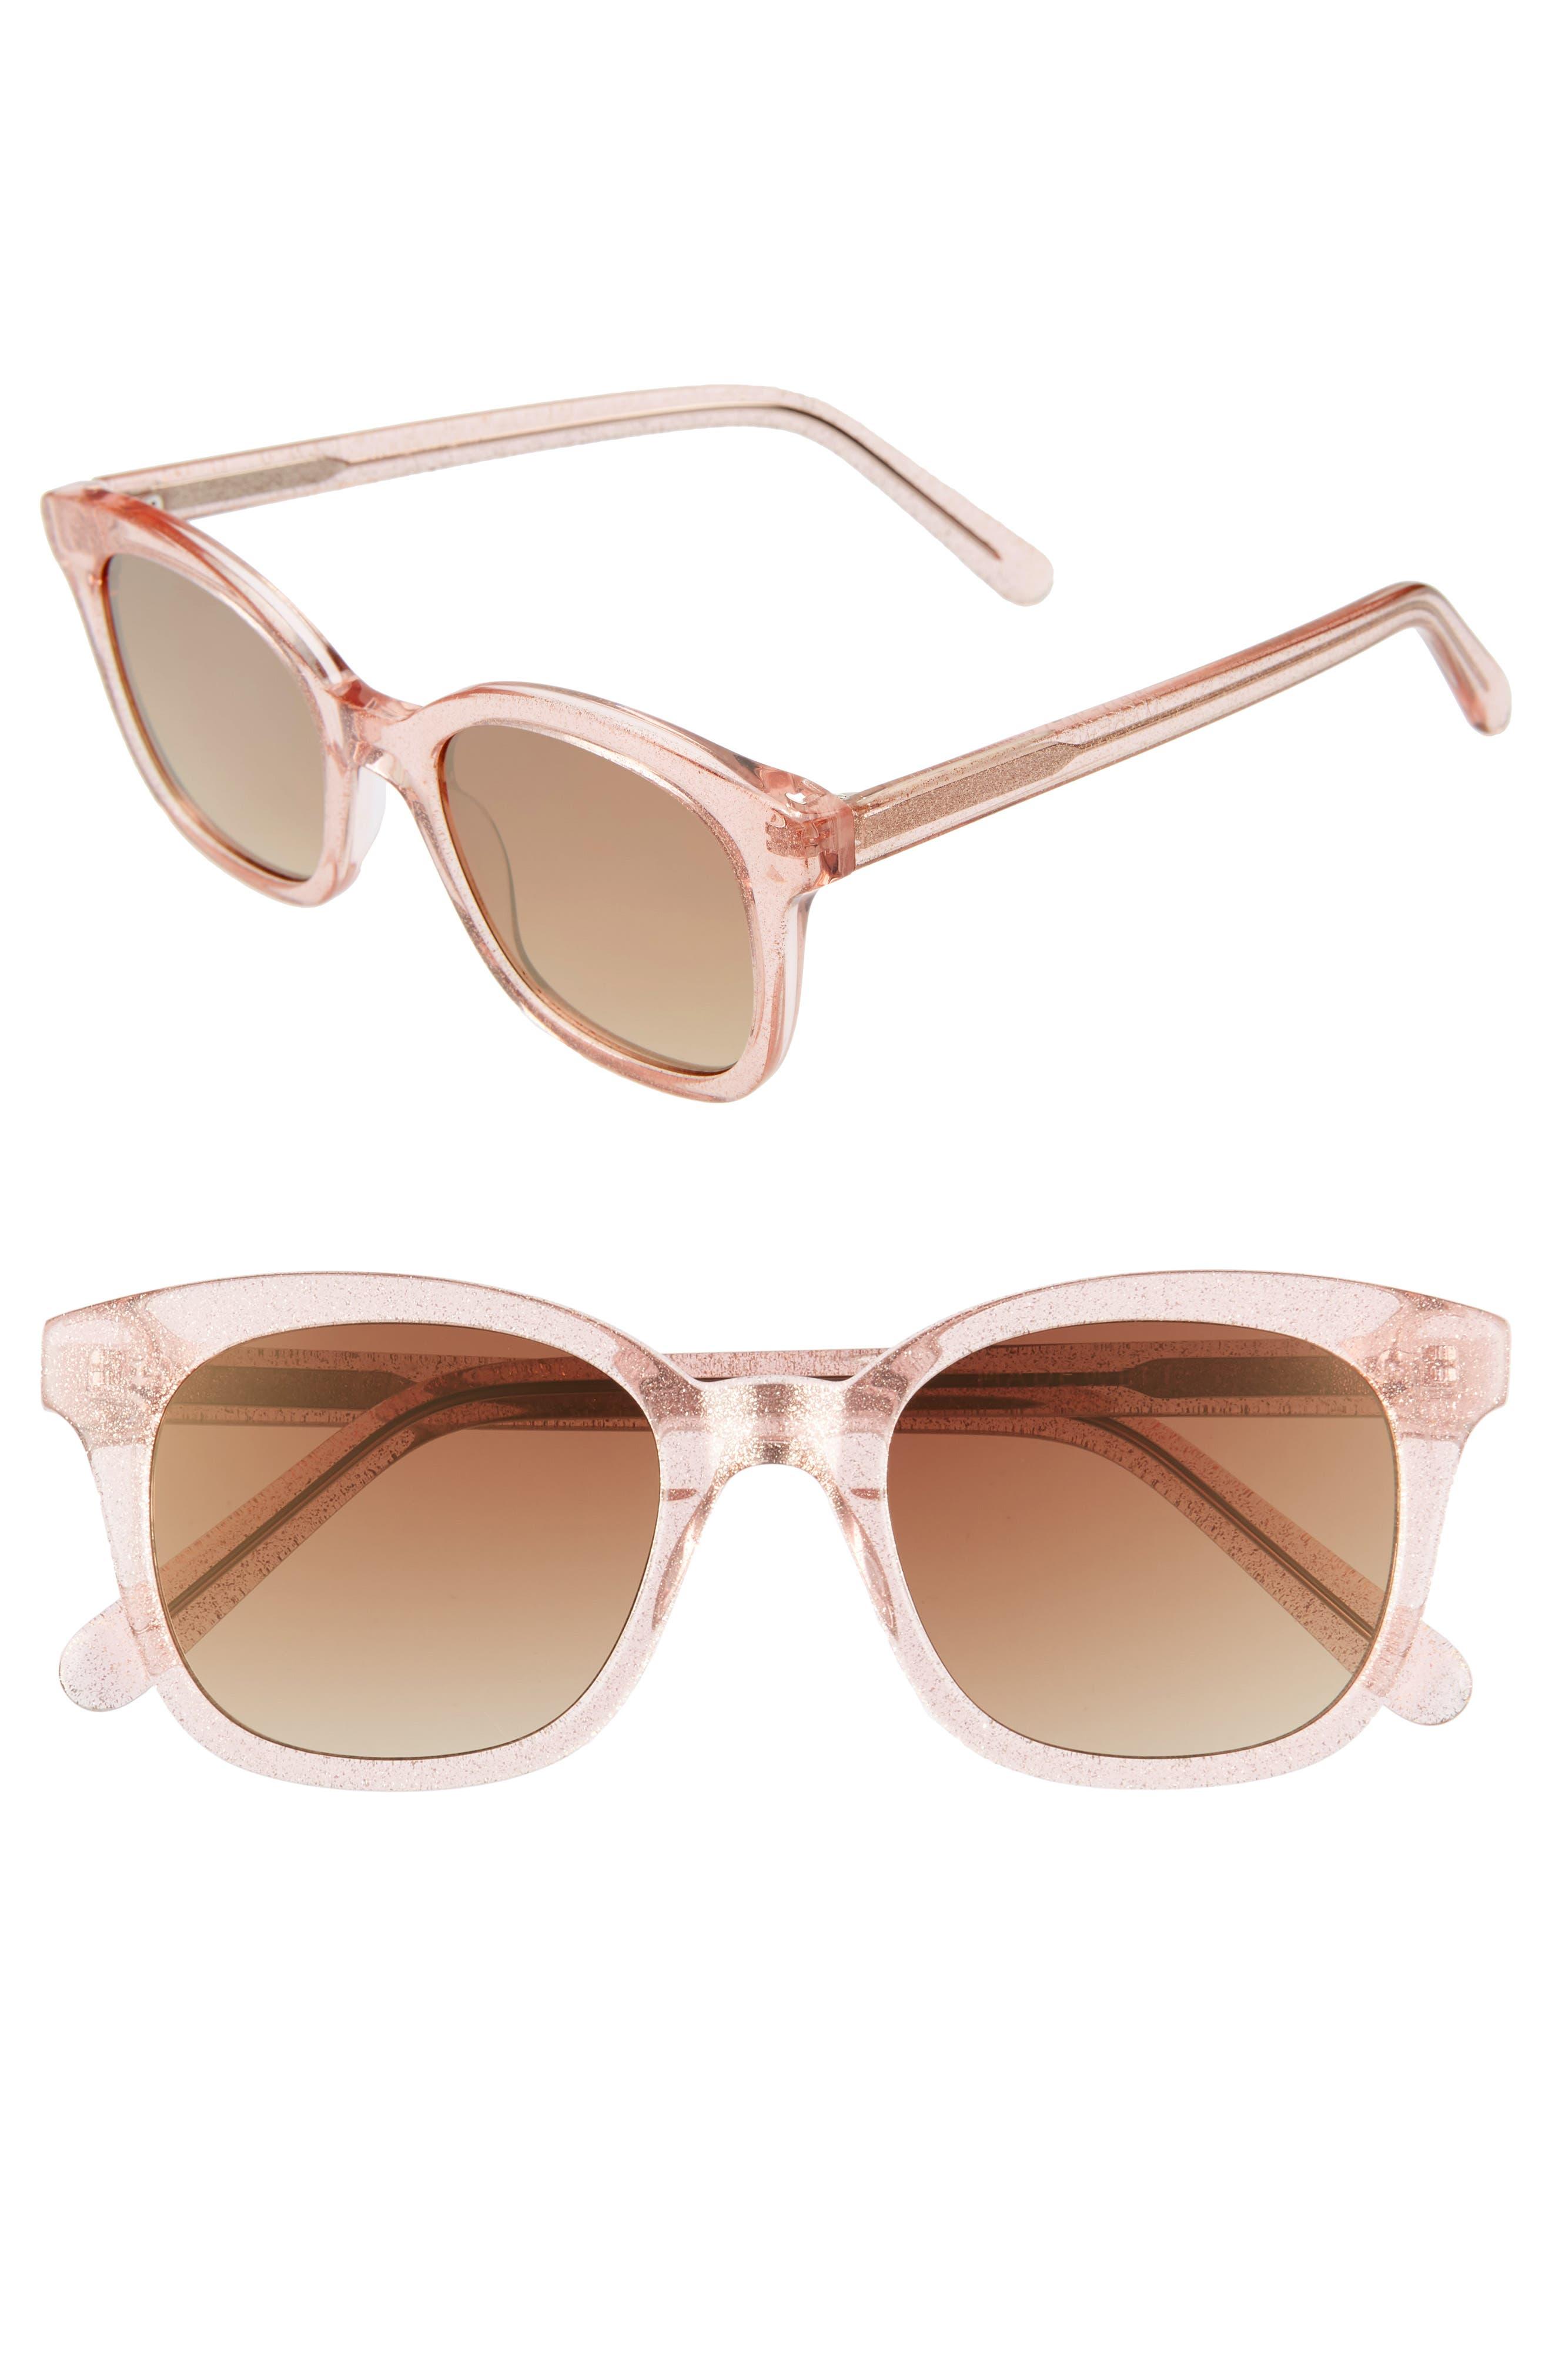 Madewell Venice 4m Flat Frame Sunglasses - Light Pink